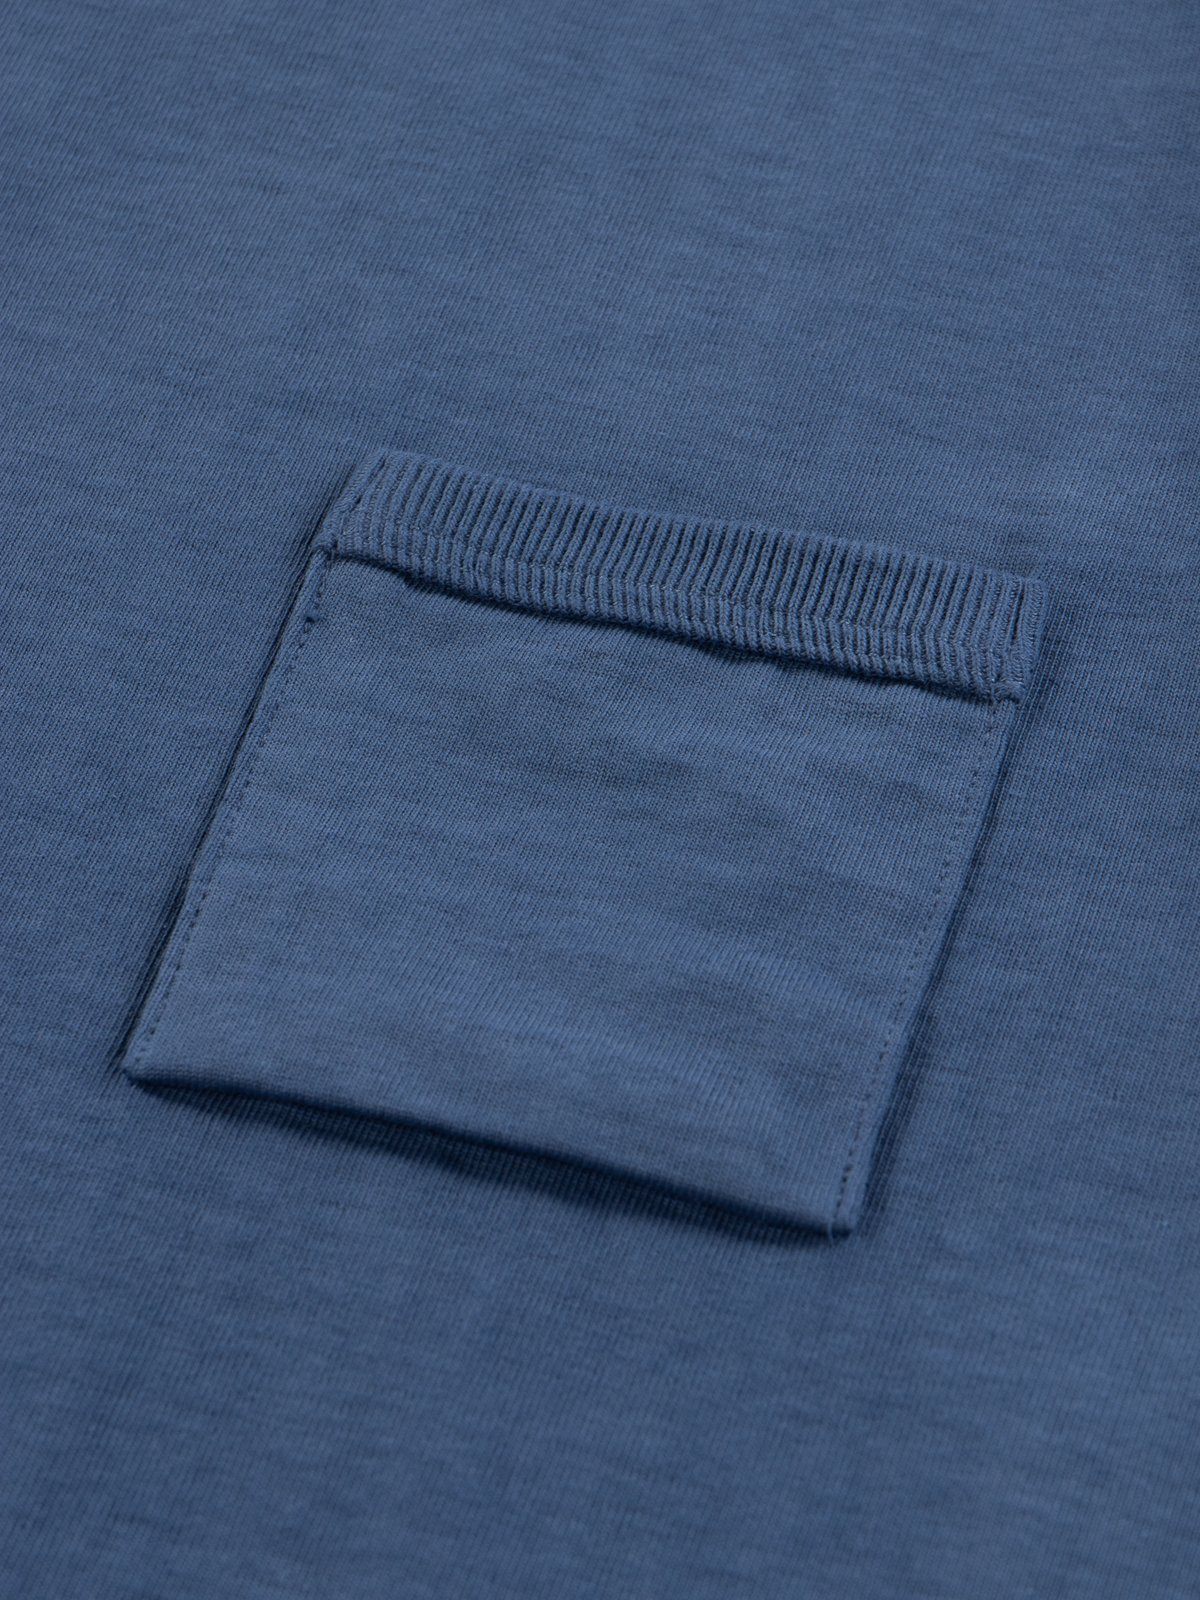 Ash Blue Dotsume Pocket T–Shirt - Image 5